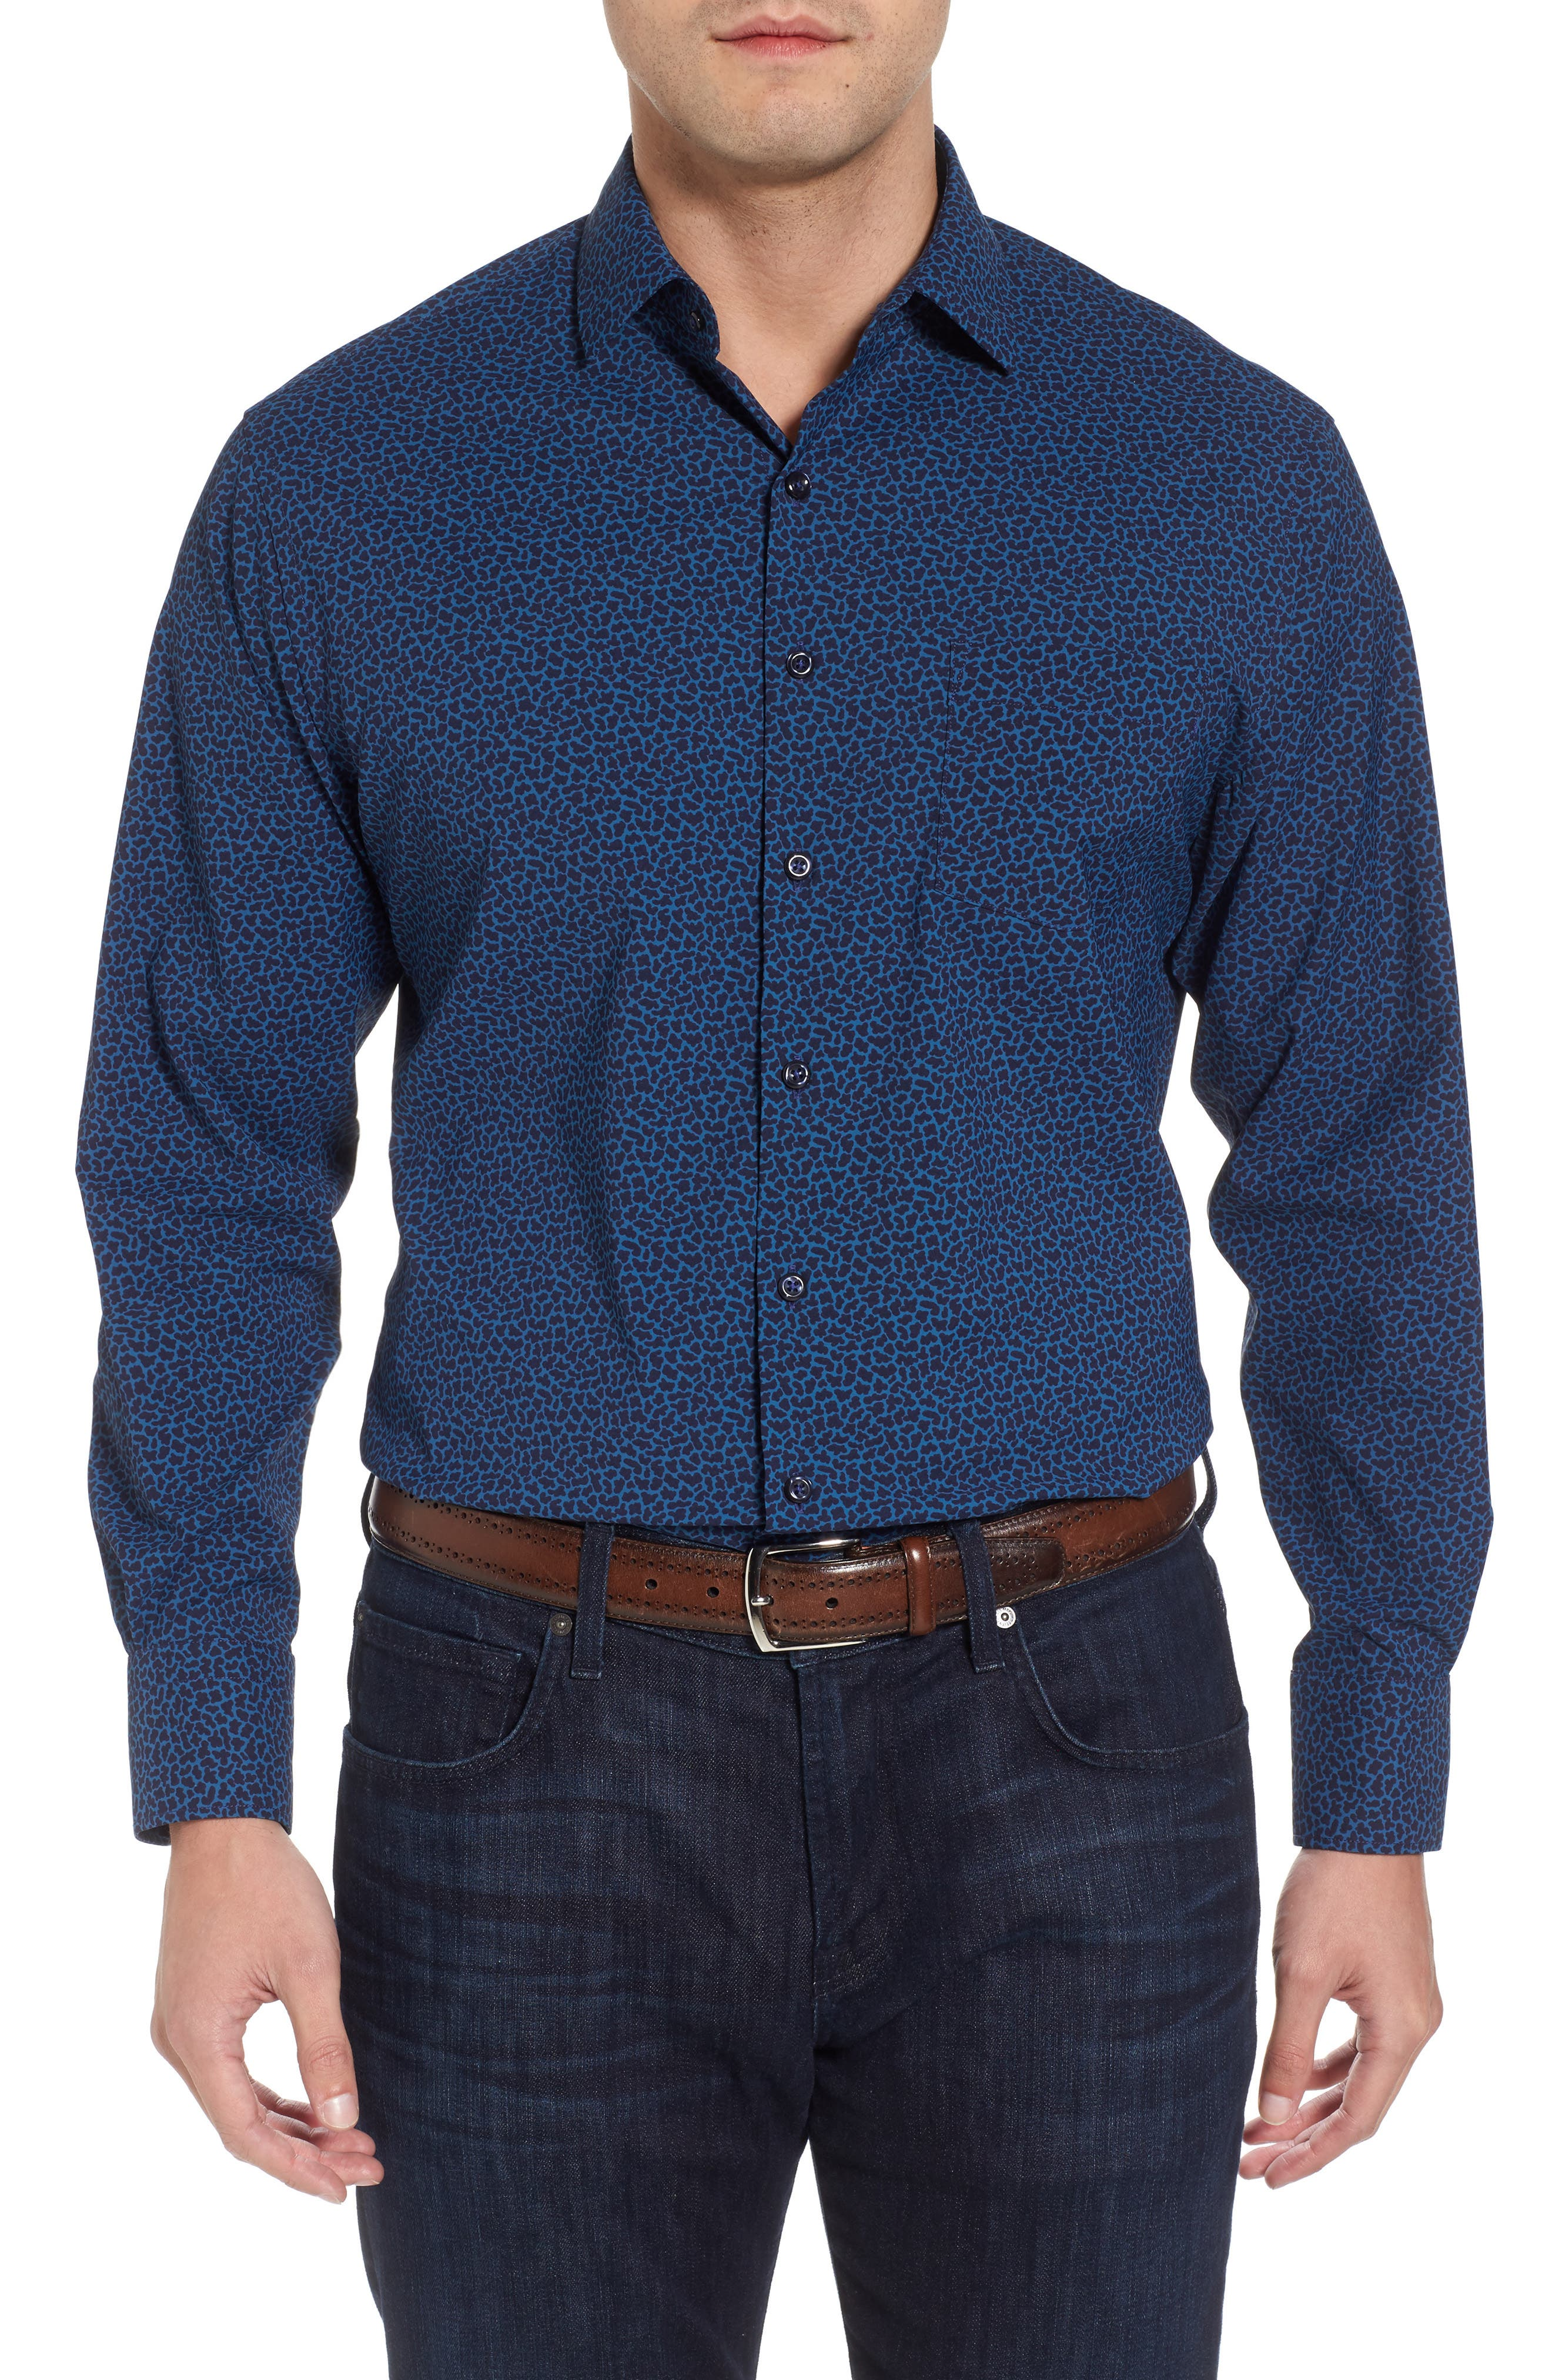 Alternate Image 1 Selected - Peter Millar Townson Regular Fit Mini Camo Performance Sport Shirt